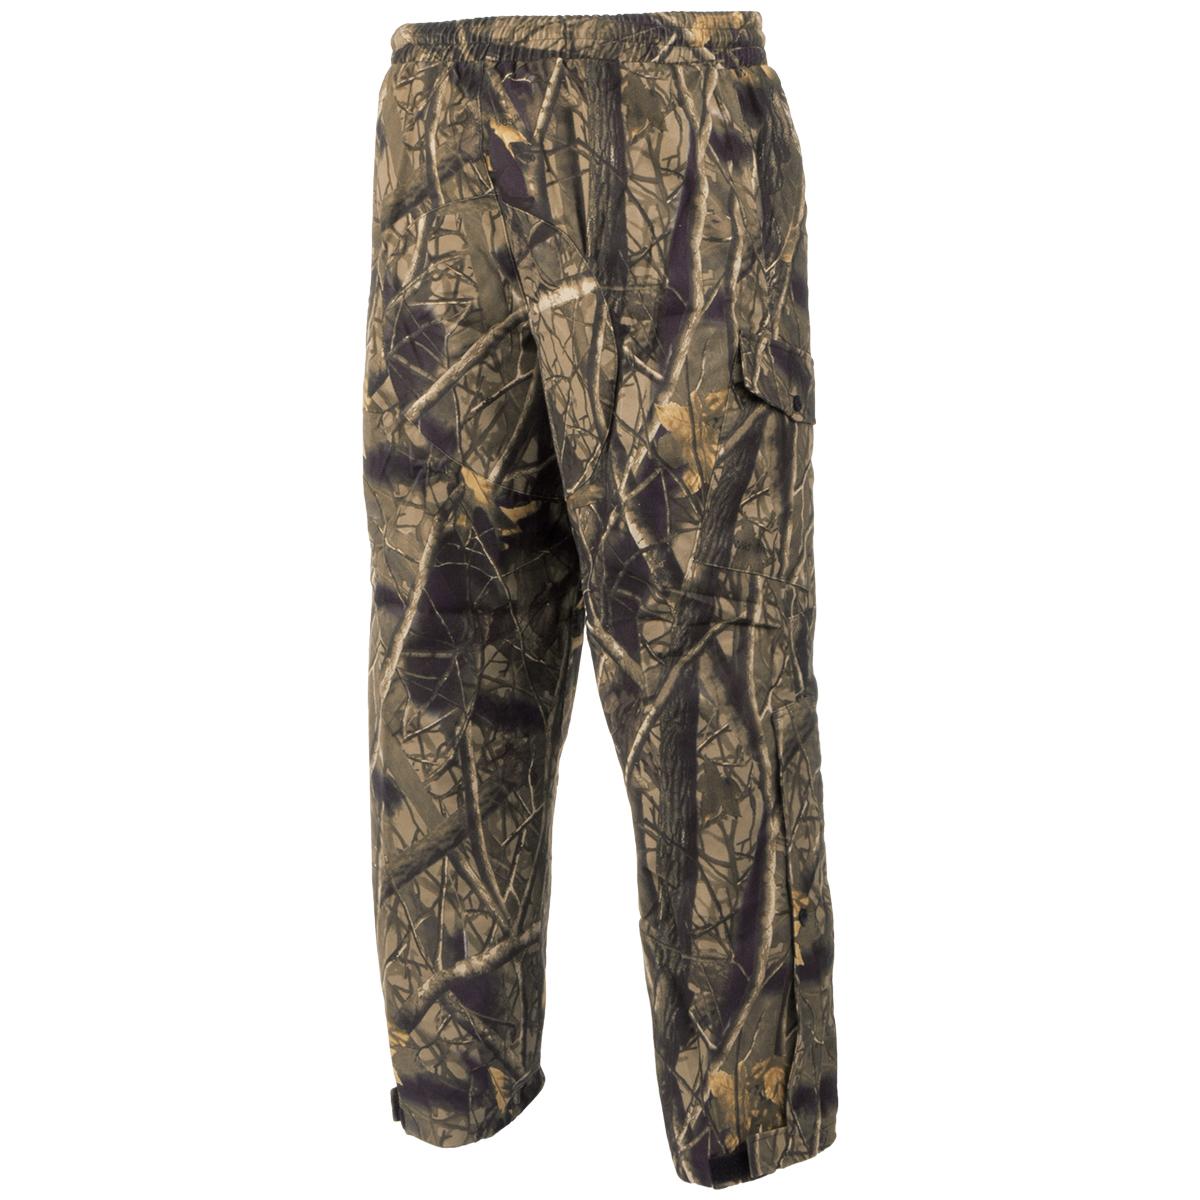 mil tec wild trees hd jagd hose wandern trekking herren j ger tarnung hose camo ebay. Black Bedroom Furniture Sets. Home Design Ideas